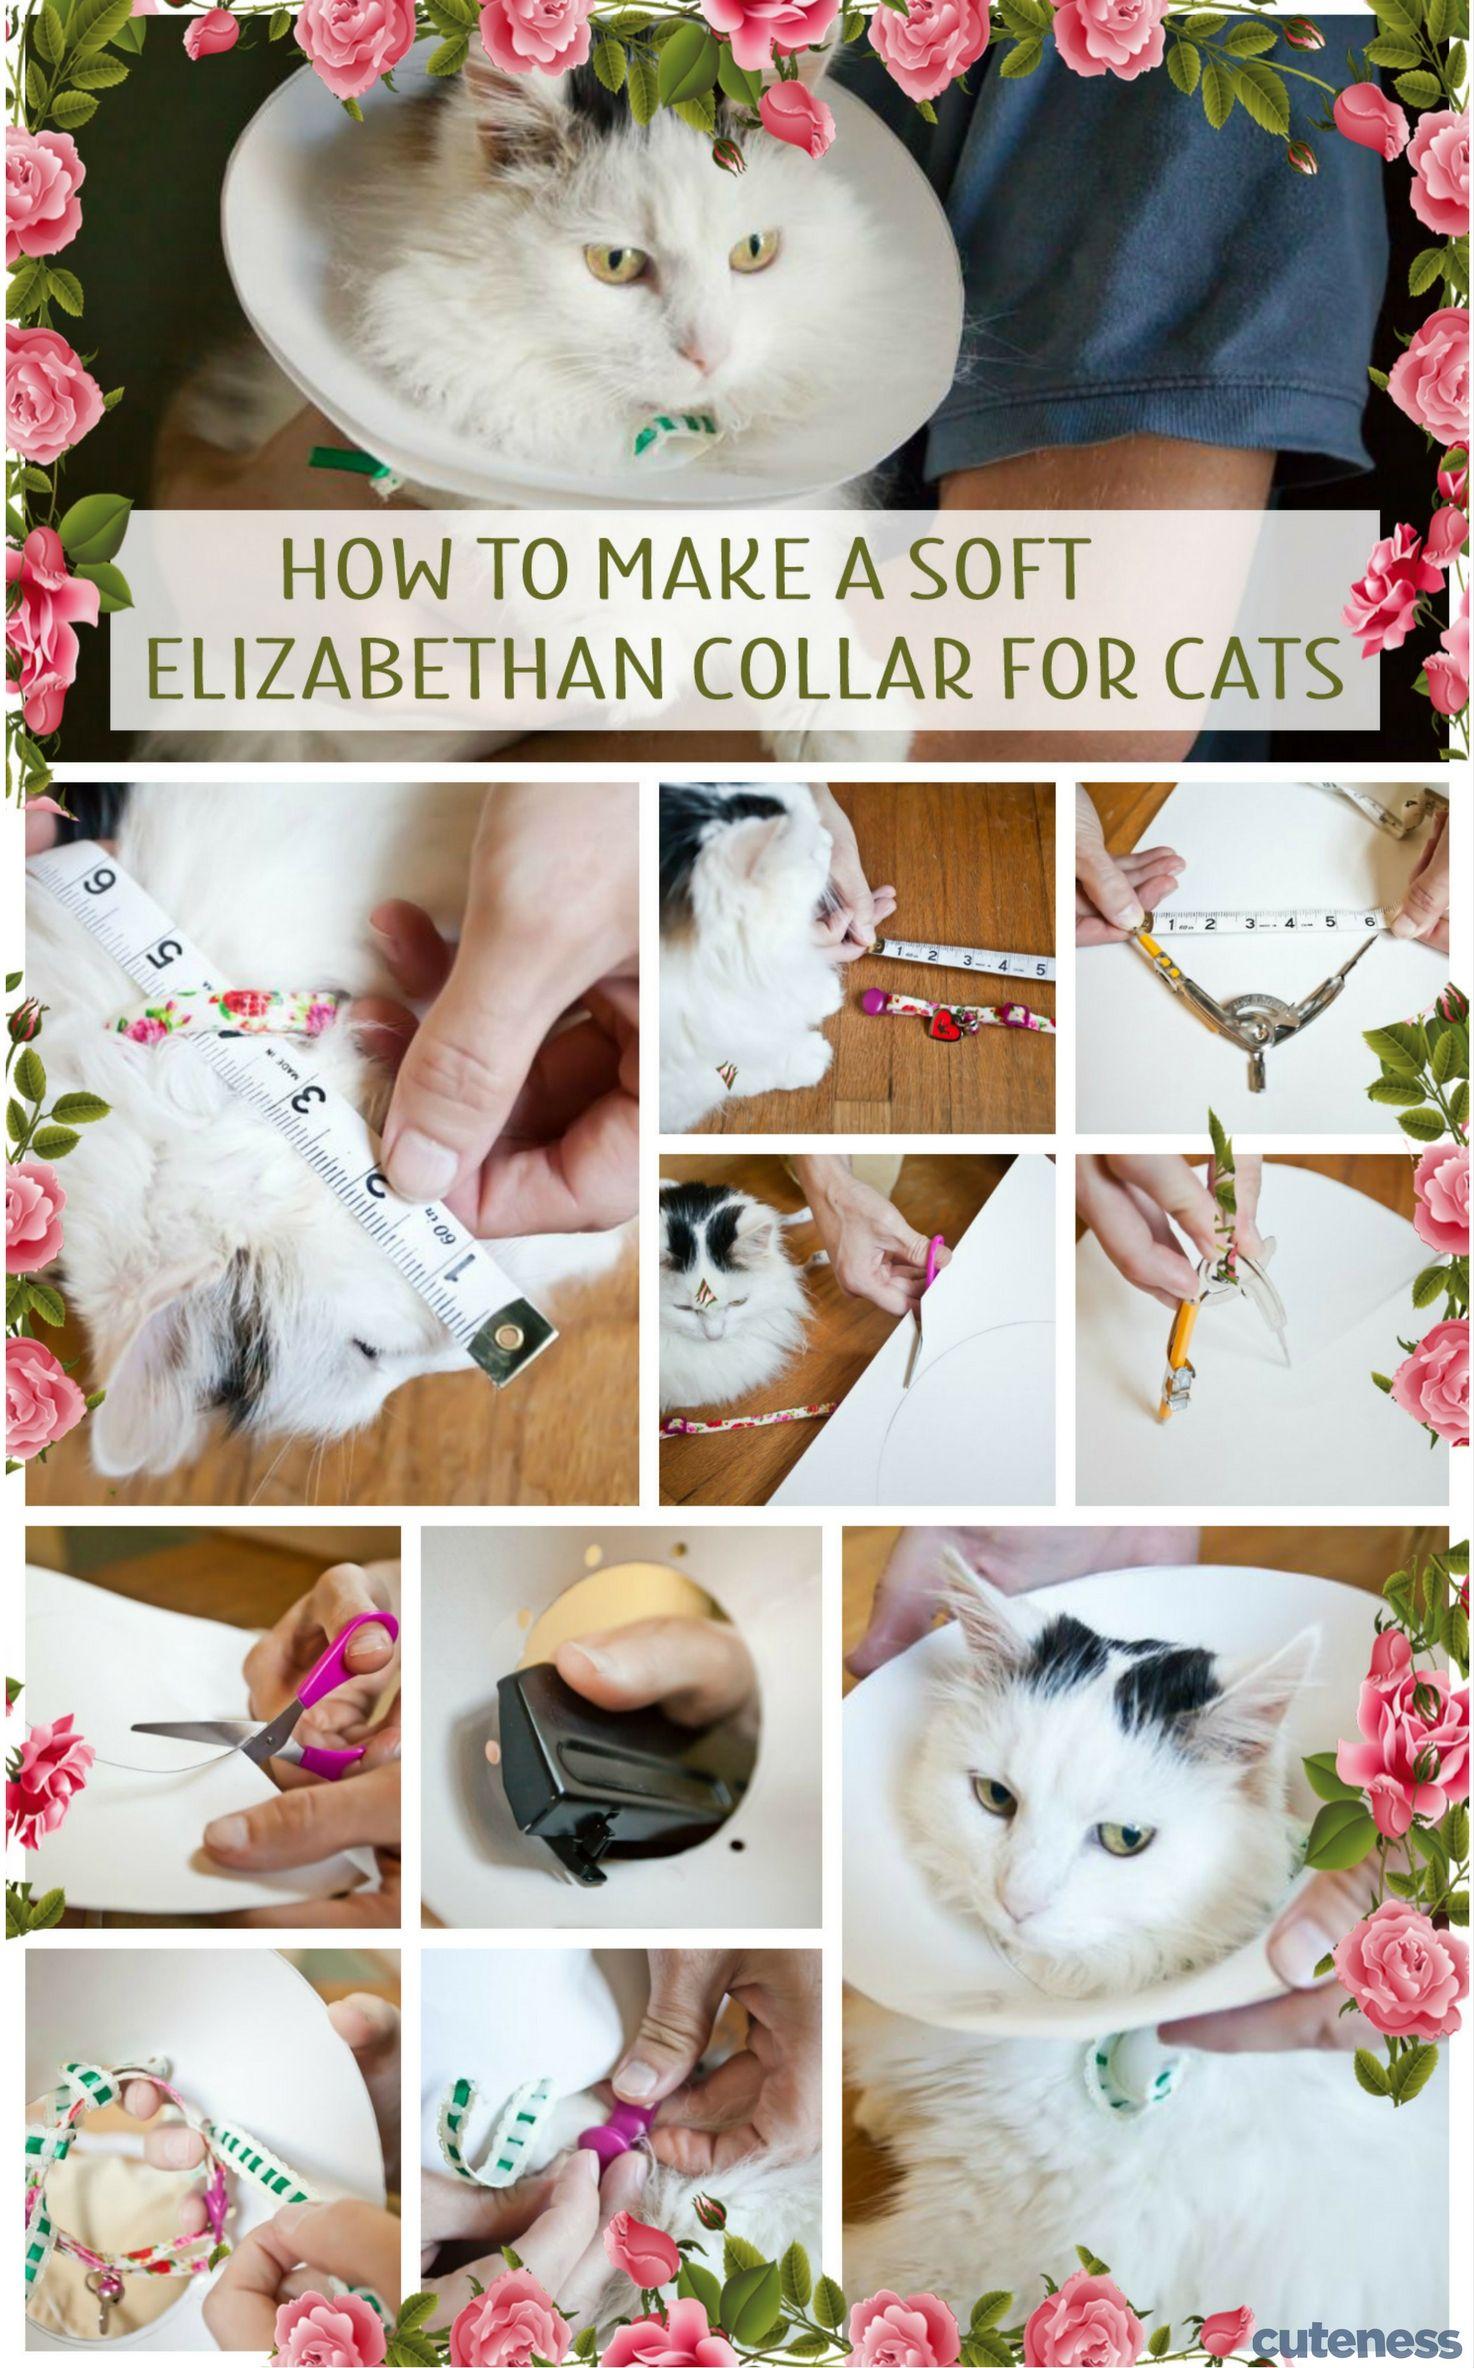 3d15f1b46ed8f1866682c33ae550cb56 - How To Get My Cat To Wear A Collar